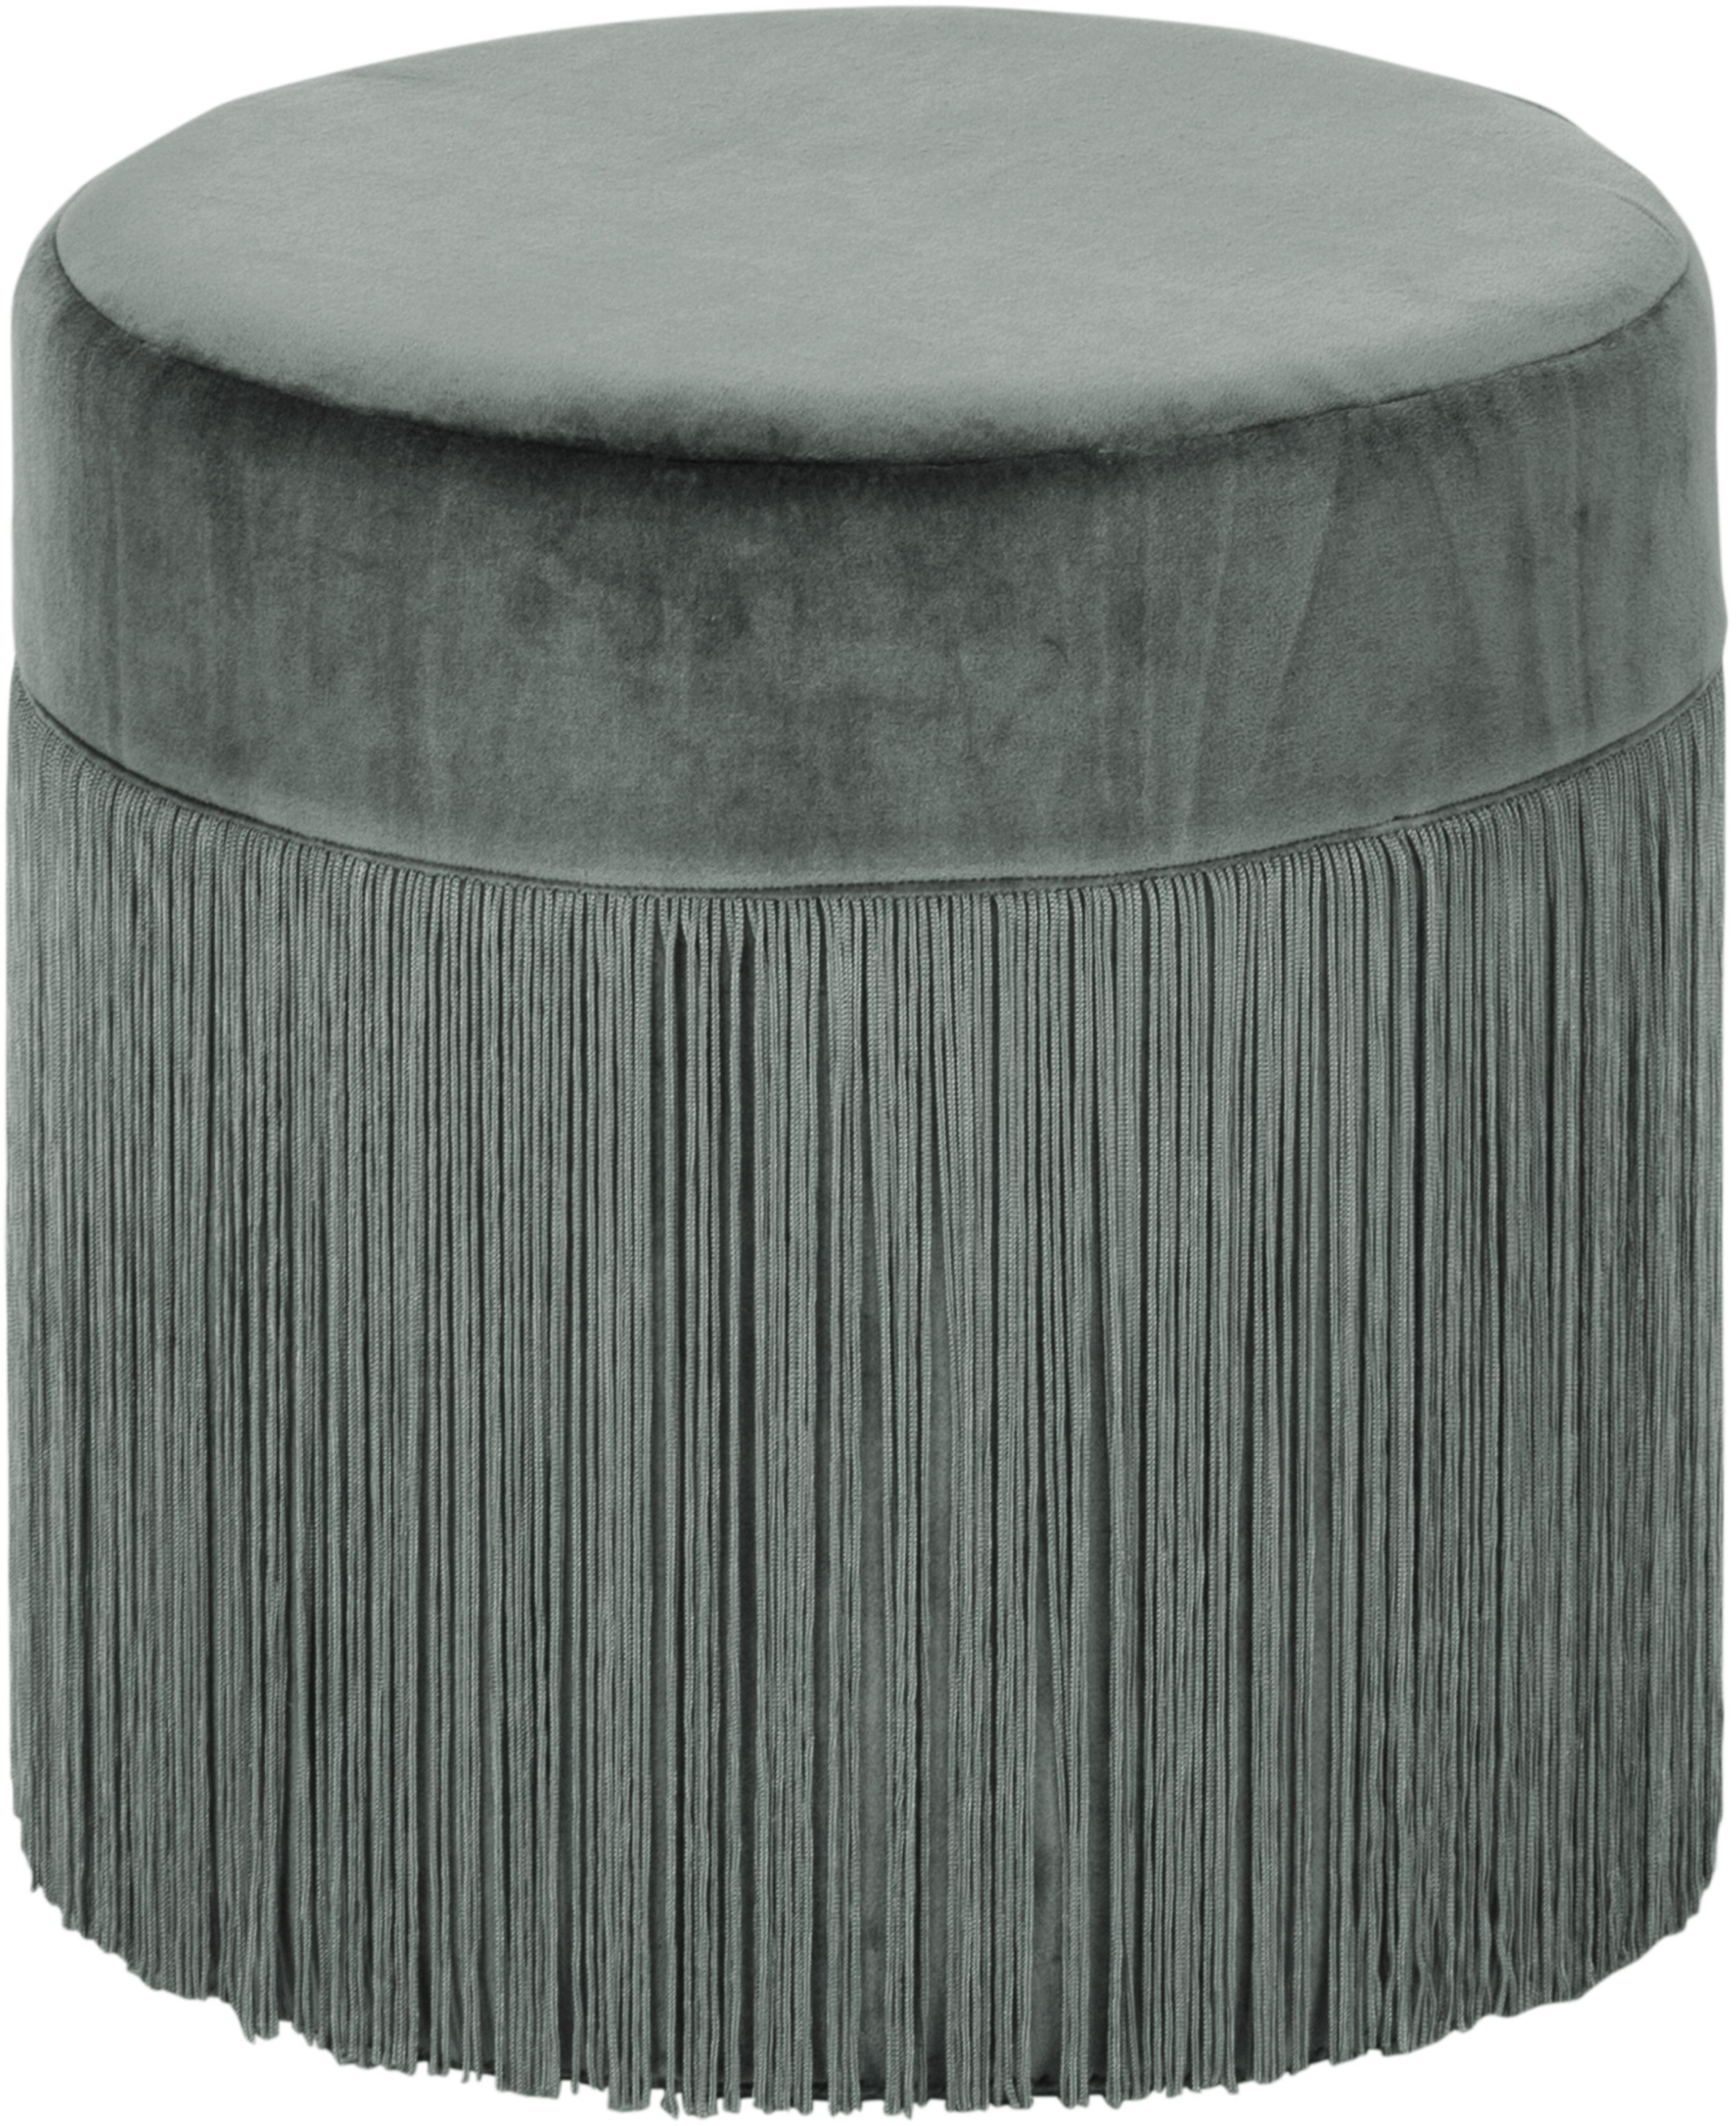 Pouf con frange Adriana, Rivestimento: velluto, Frange: viscosa, Verde salvia, Ø 40 x A 40 cm